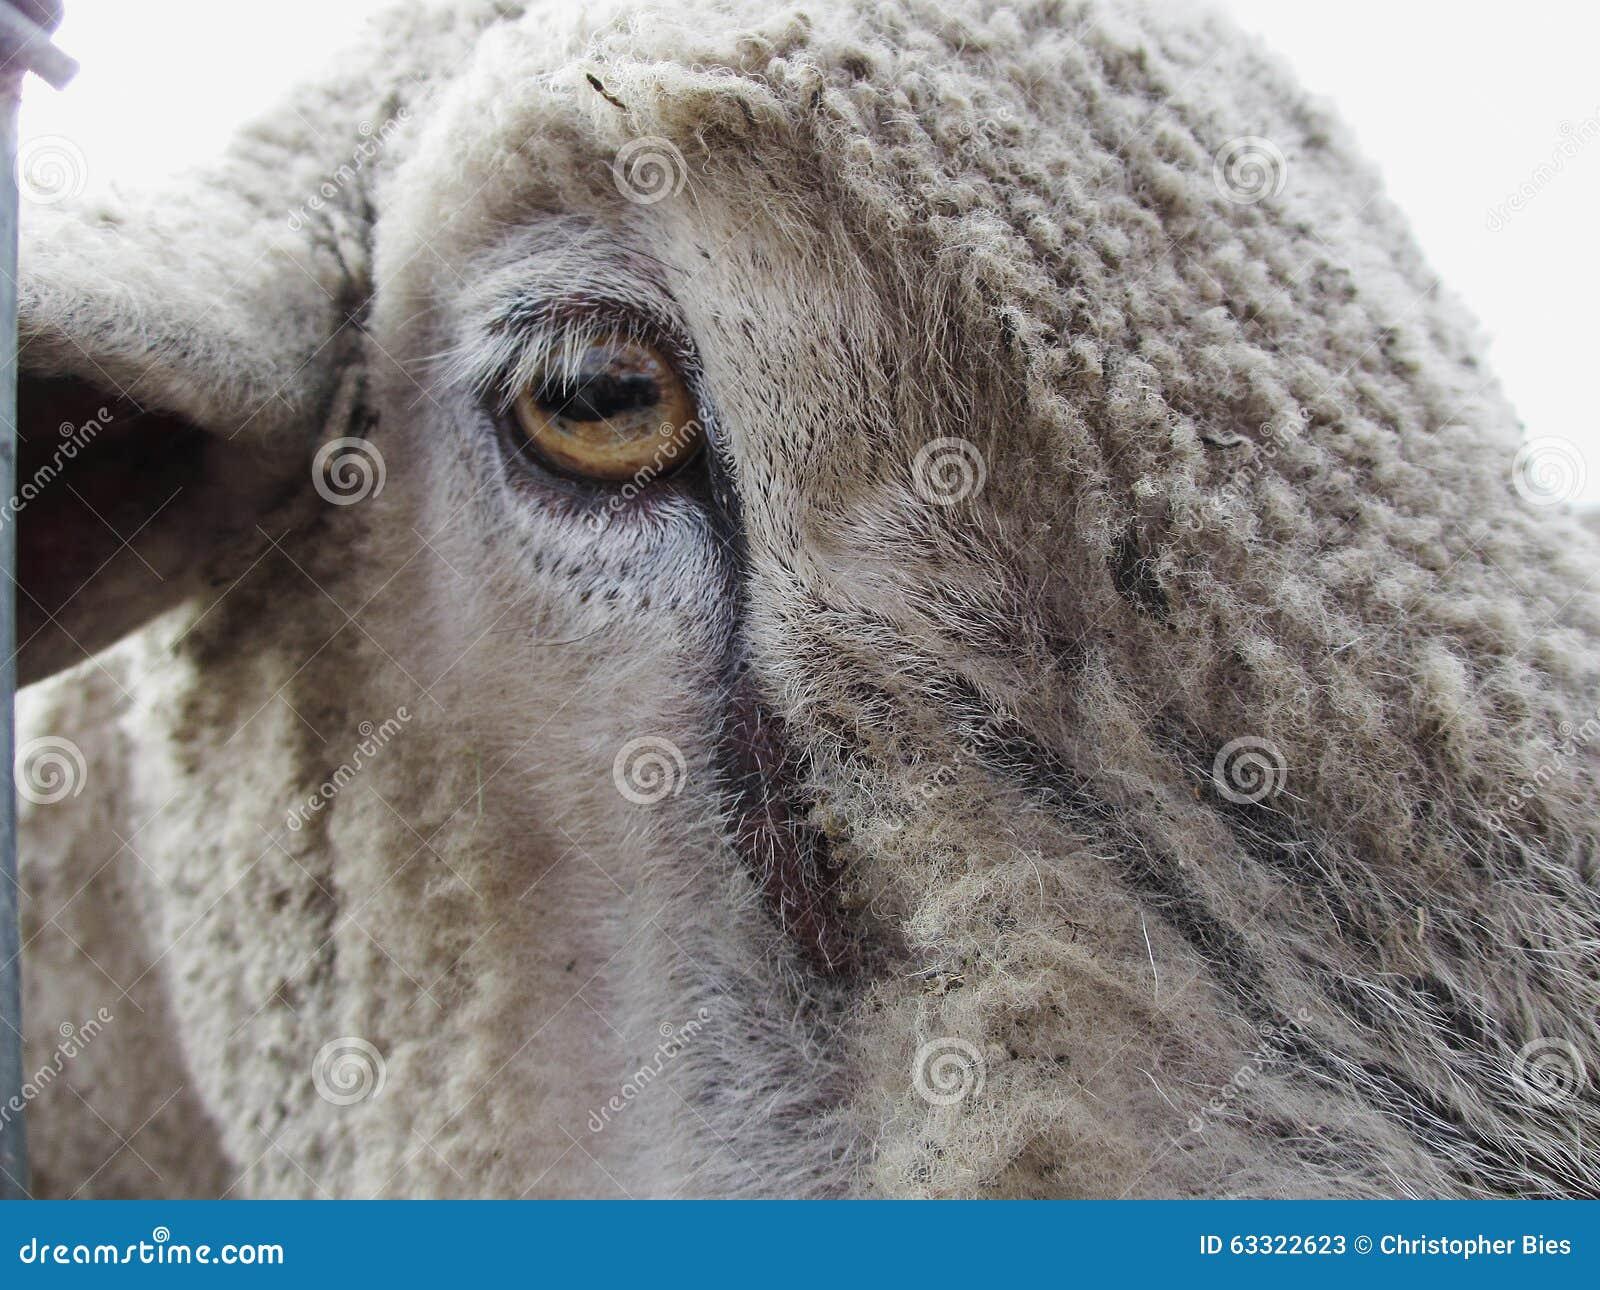 Sheep Eye stock image. Image of dirty, close, hairy, photo - 63322623